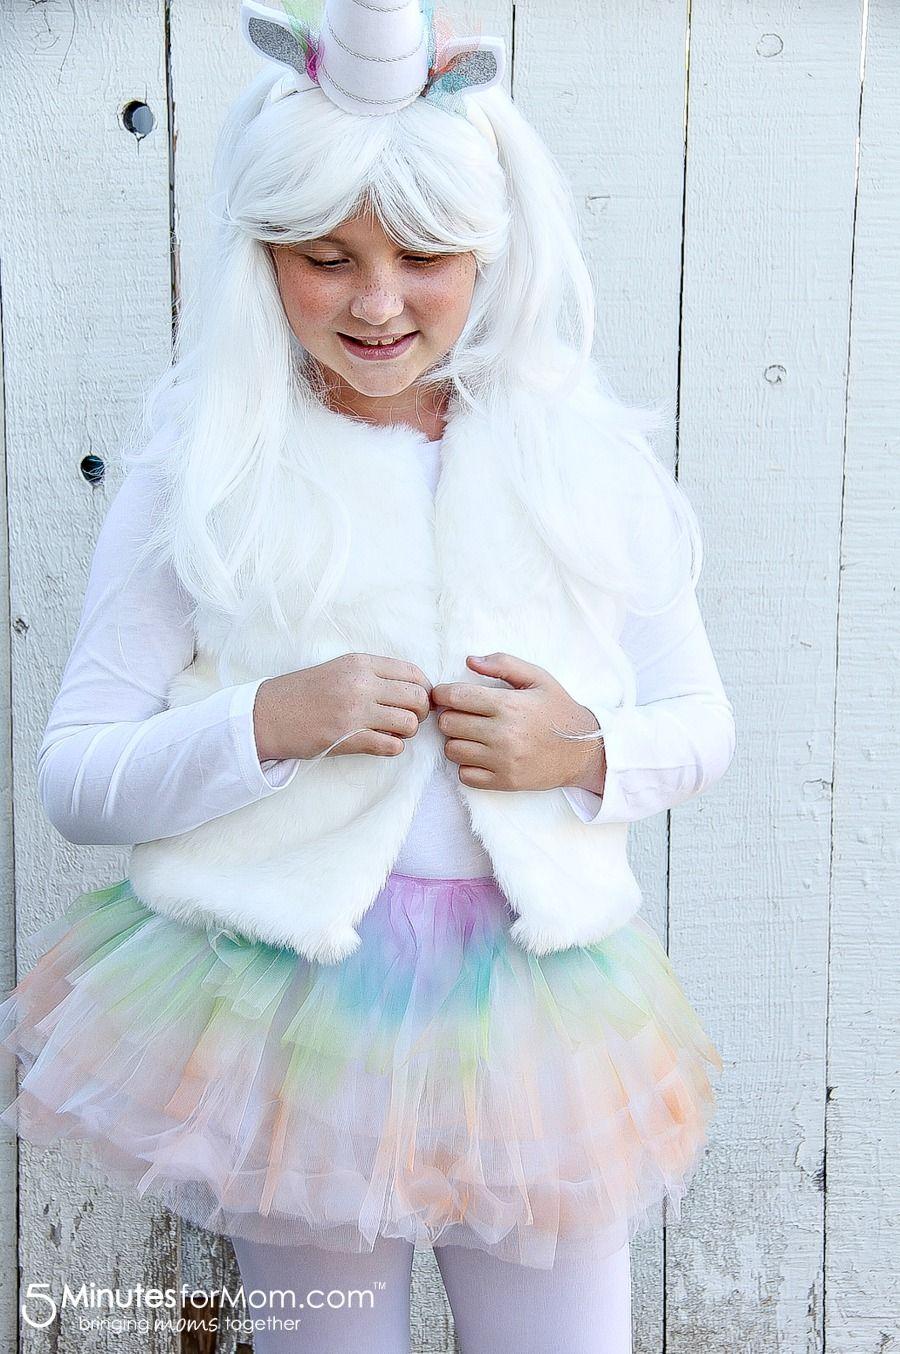 DIY Unicorn Halloween Costume - How To Make an Easy Unicorn Costume for Kids  sc 1 st  Pinterest & How To Make an Easy Unicorn Costume for Kids | Pinterest | Unicorn ...